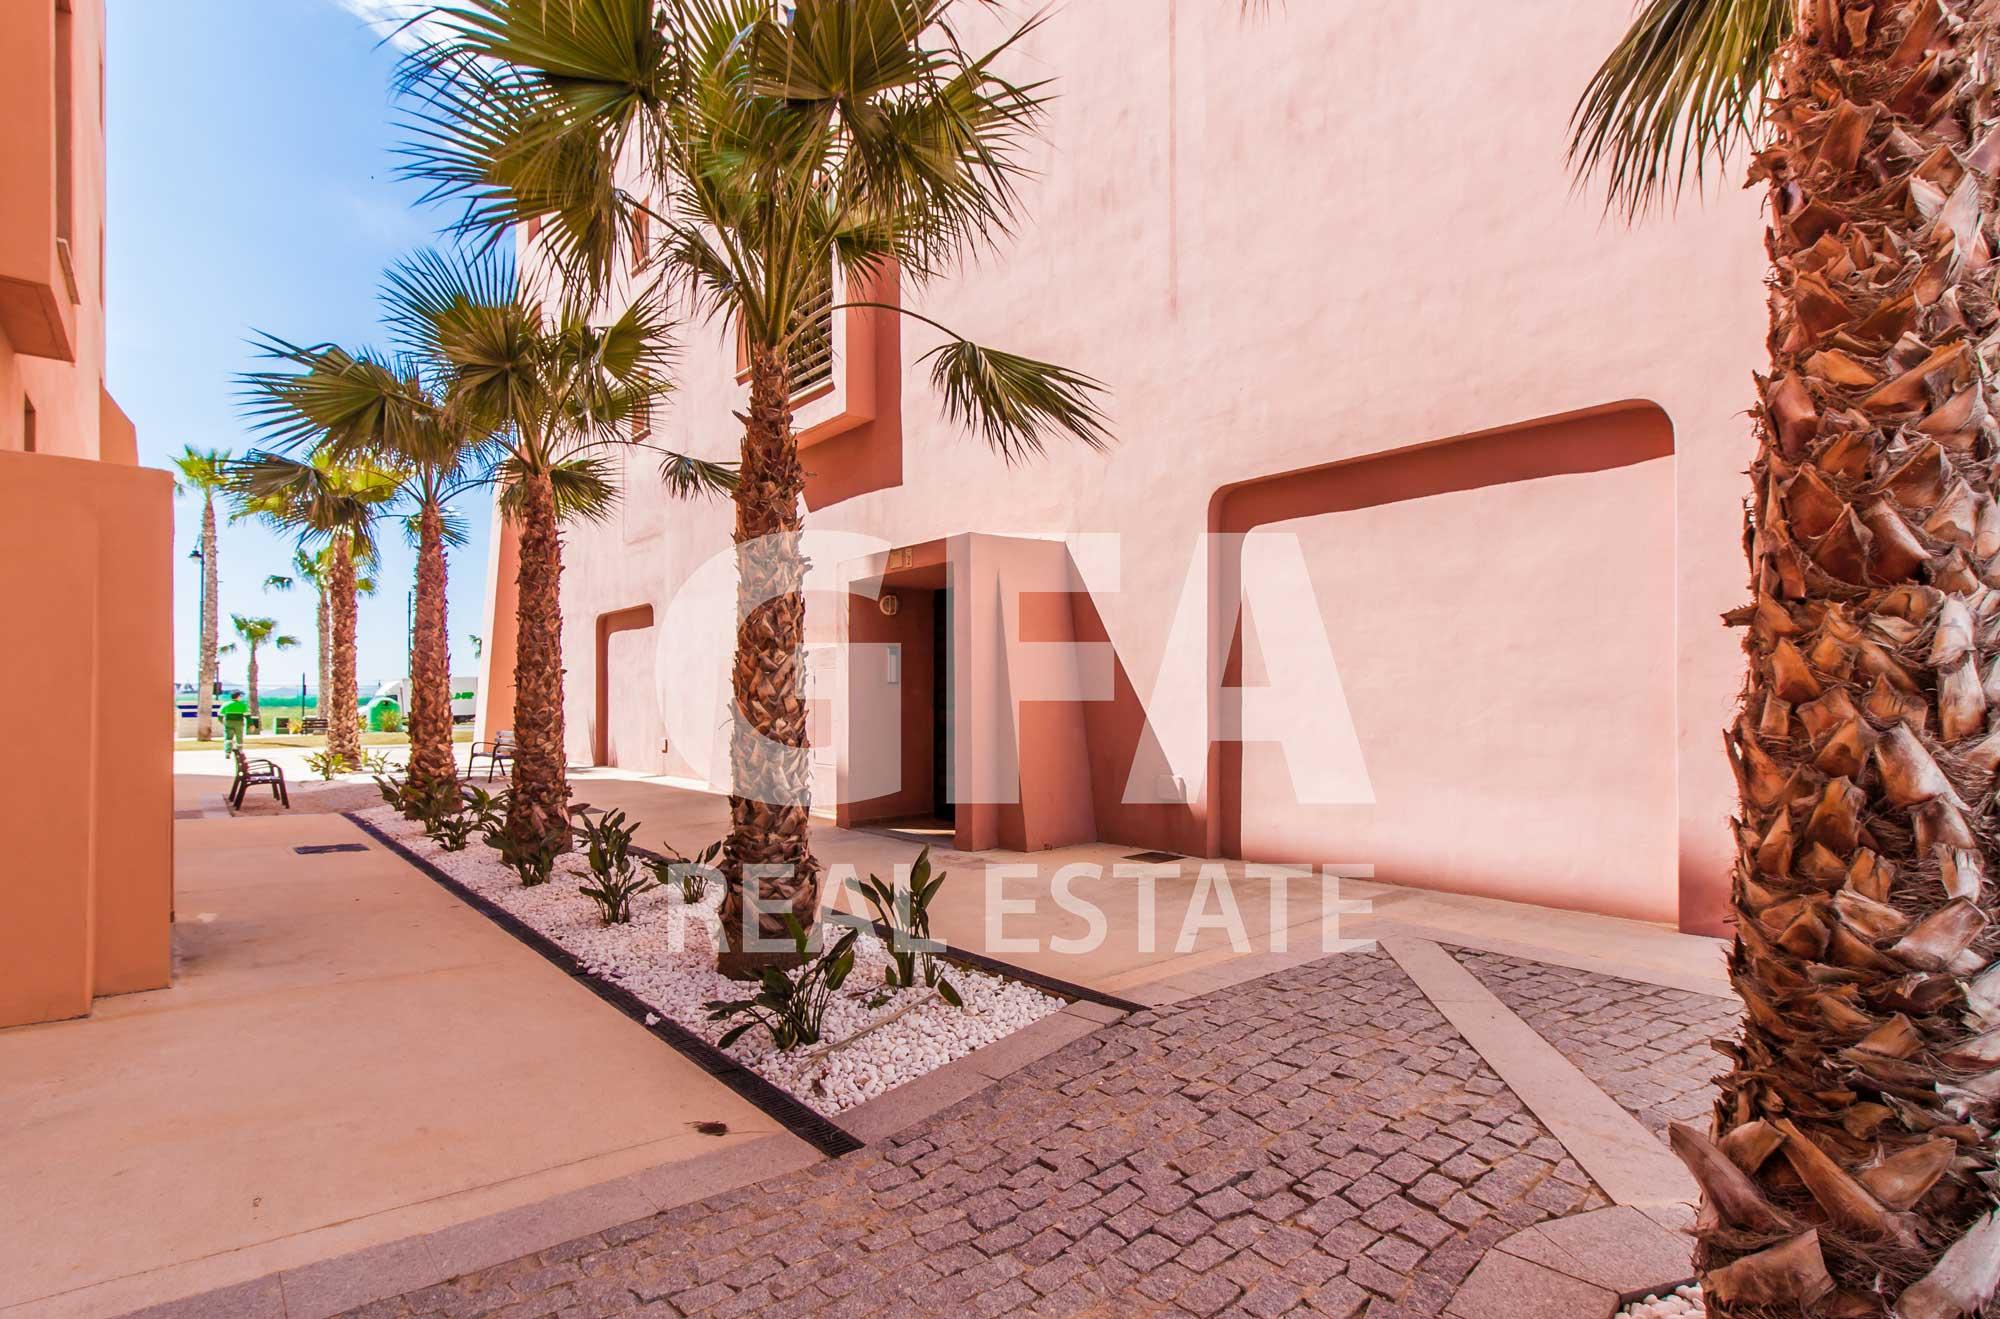 boulevard-viviendas-de-obra-nueva-resort-mar-menor (35)